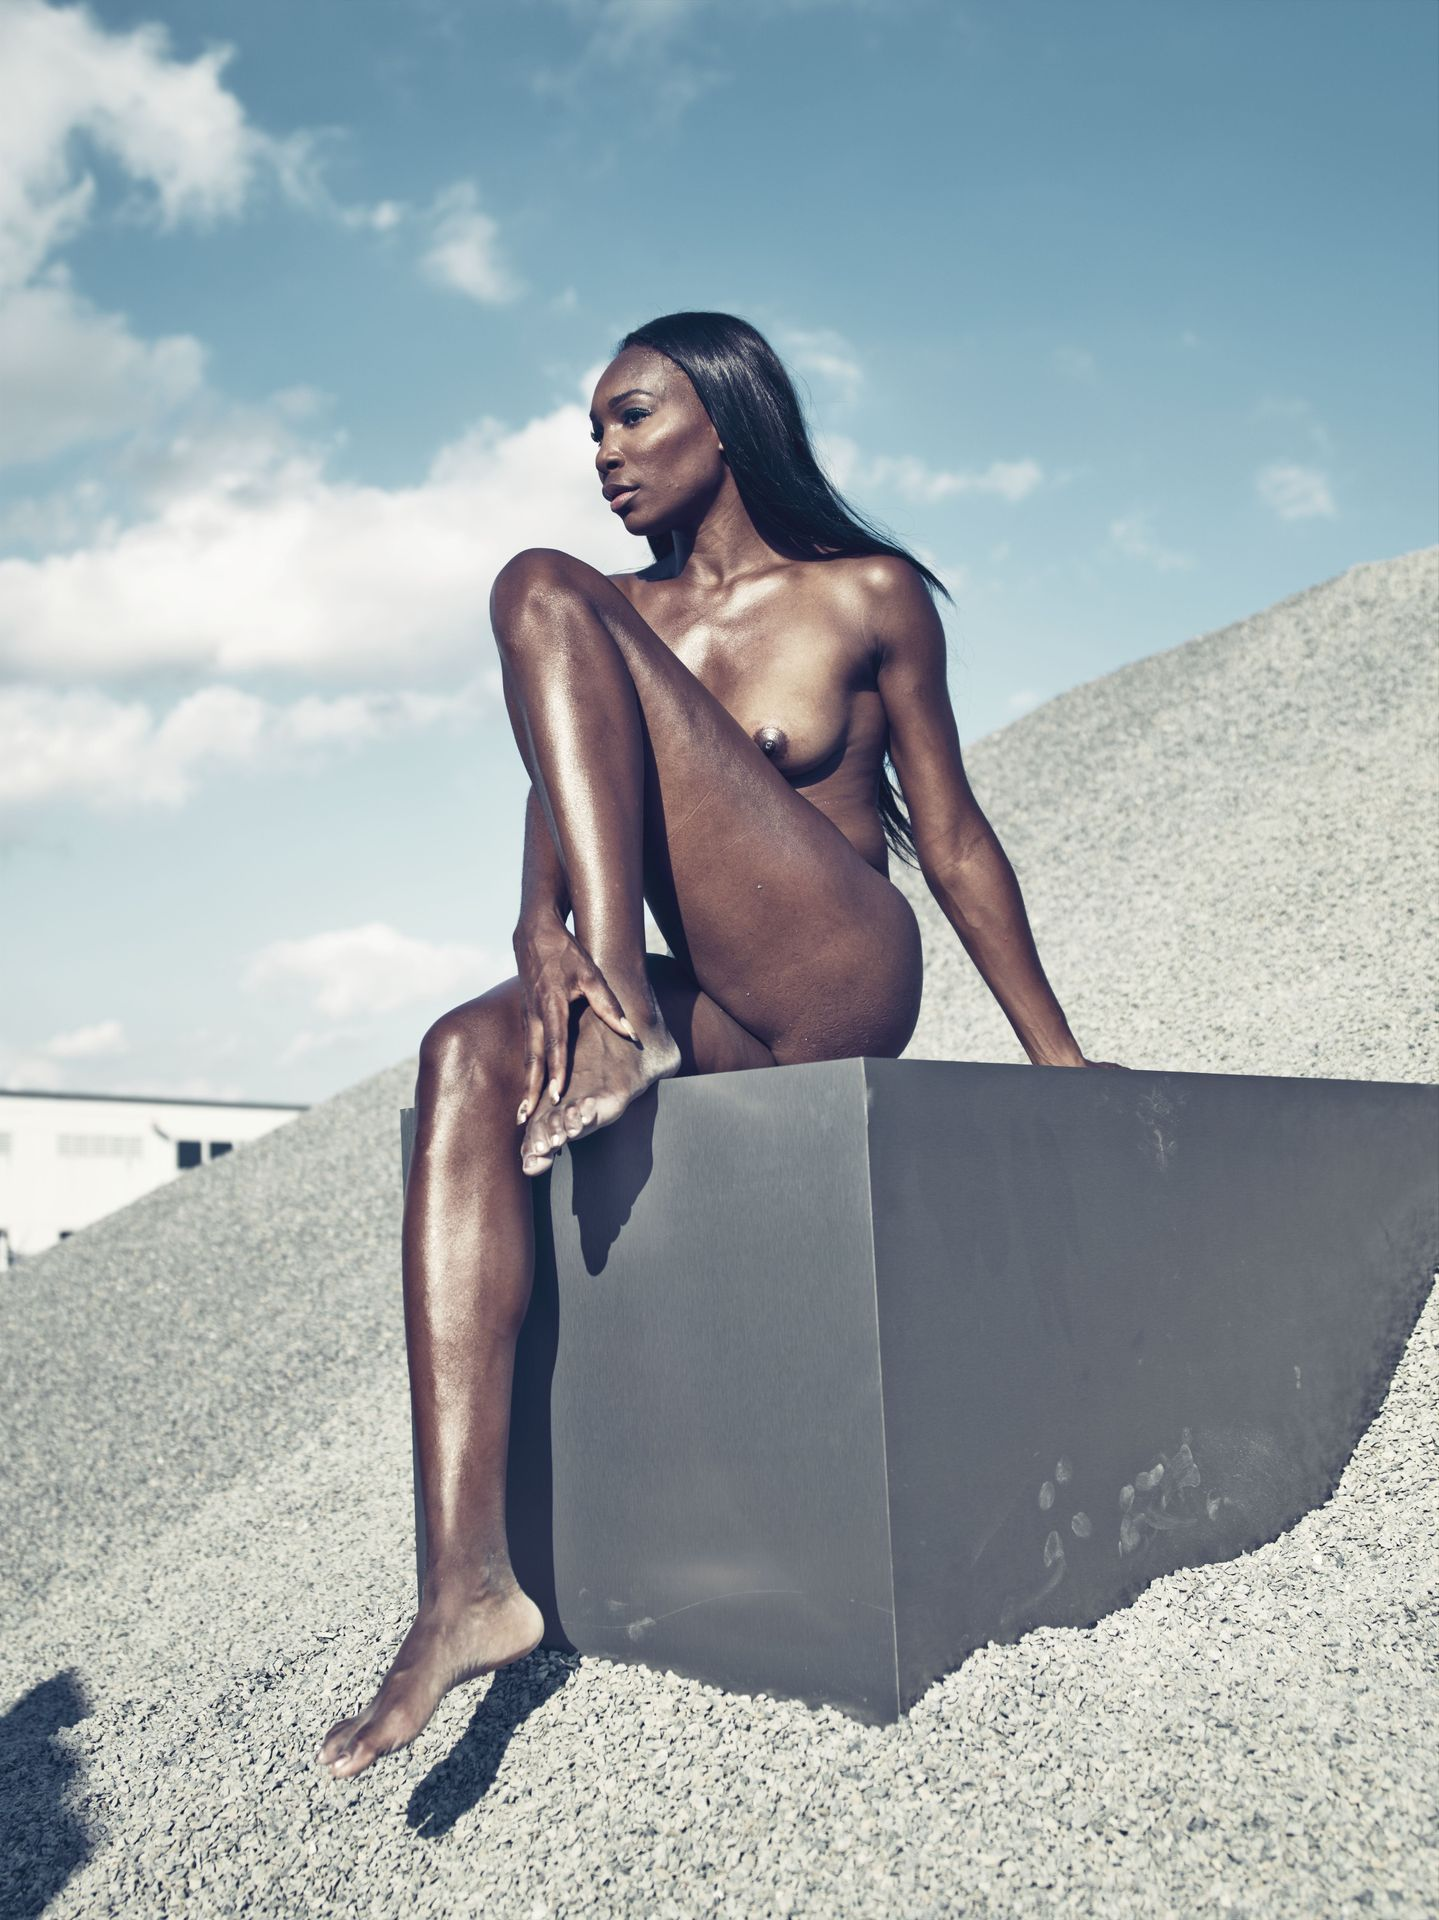 Kellie shanygne williams in the nude